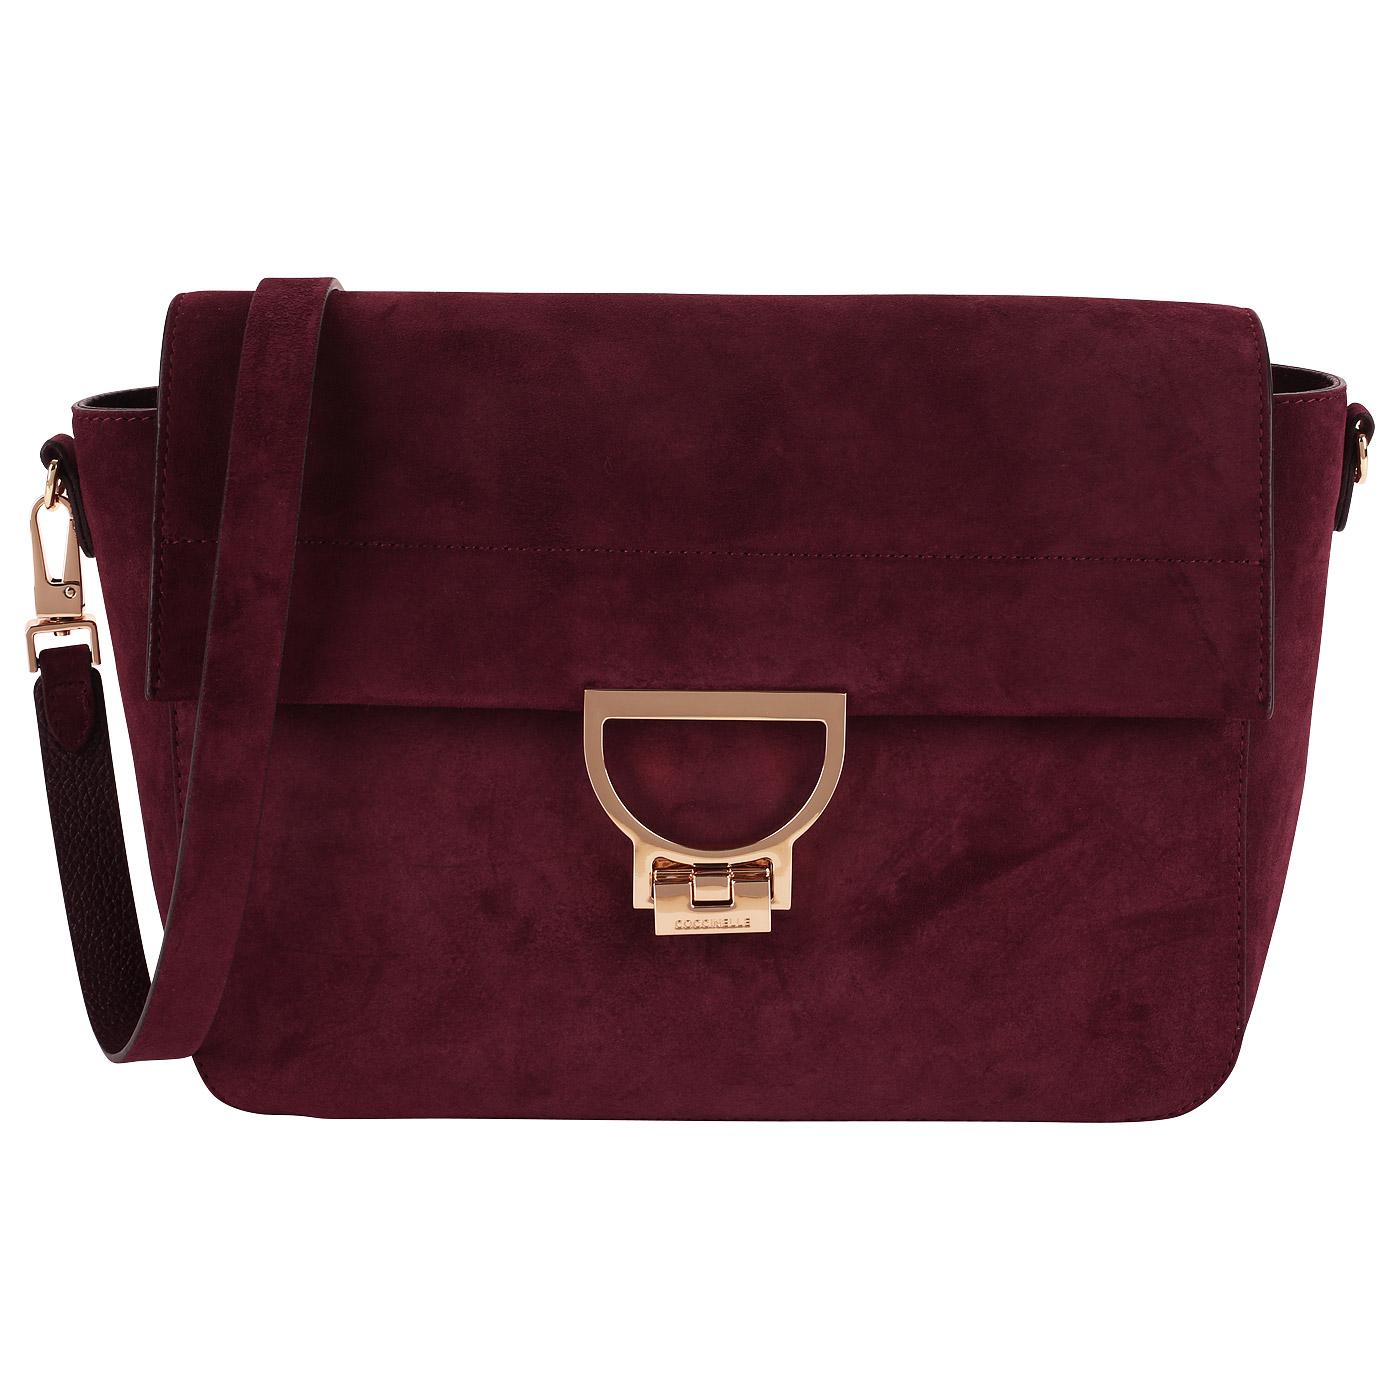 6bb89d6fa52e Замшевая сумка с откидным клапаном Coccinelle Arlettis suede CD6 12 ...